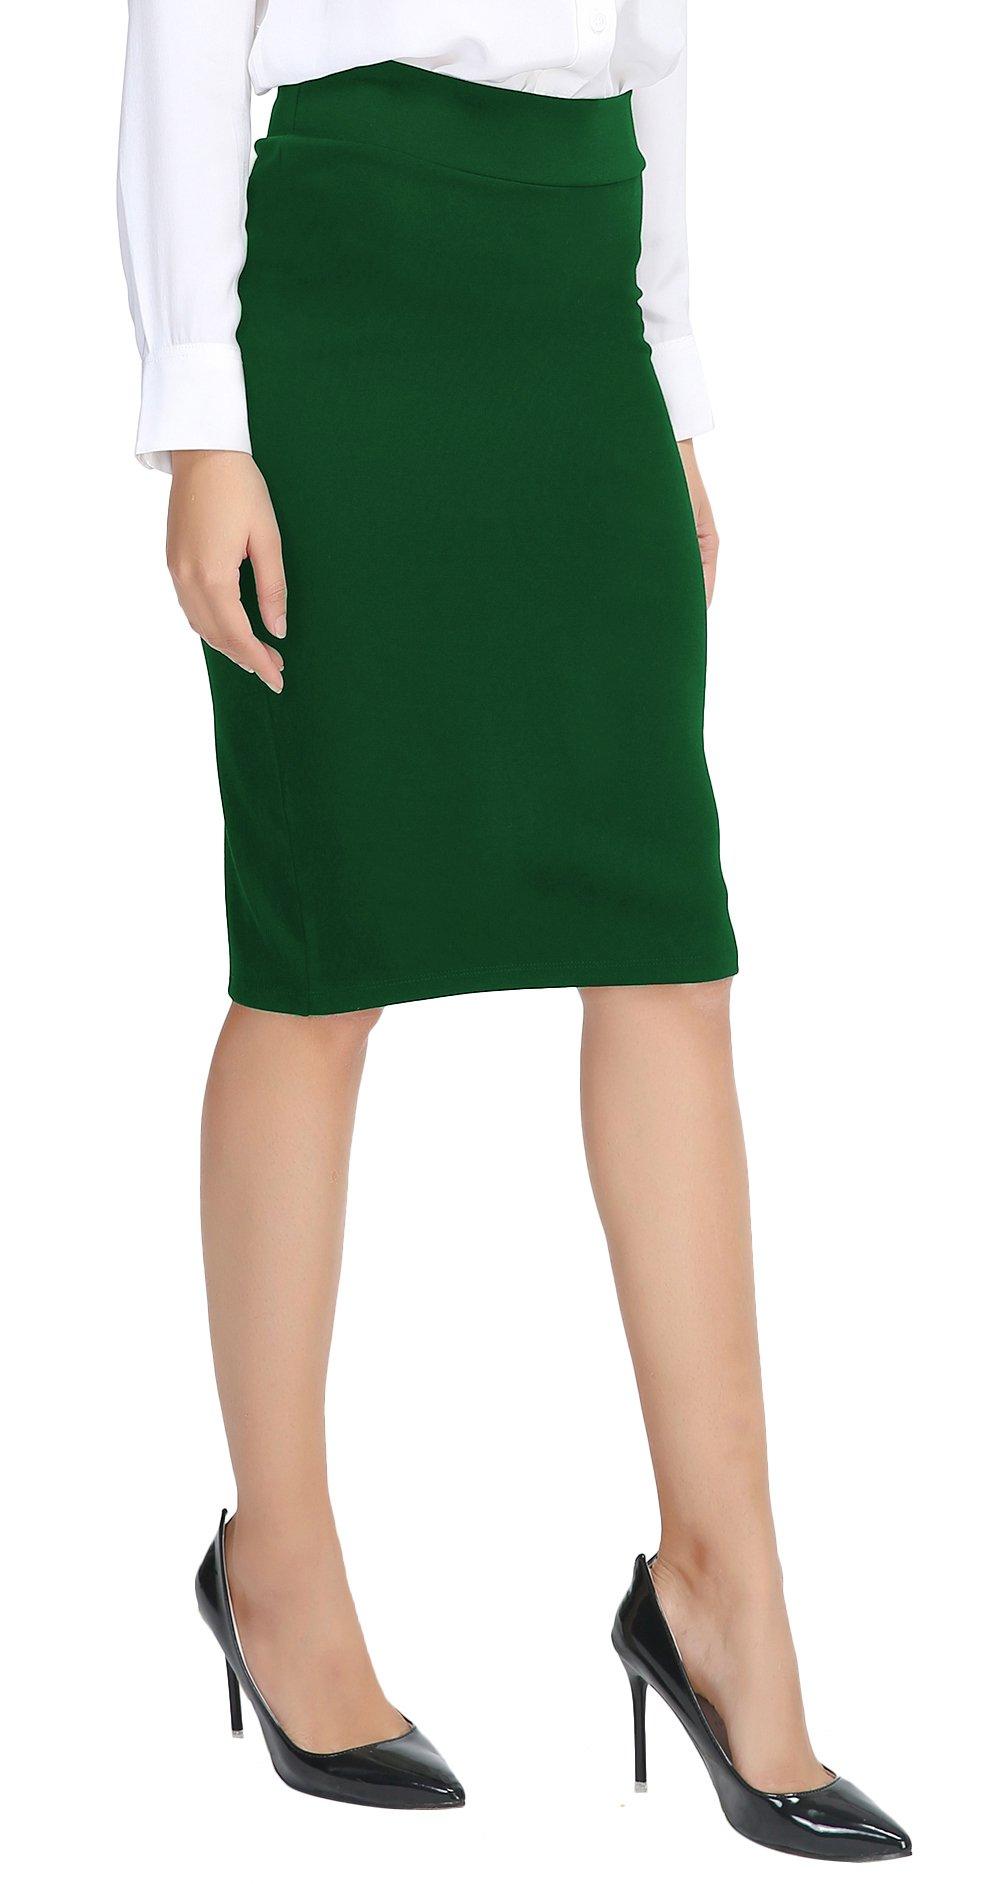 Urban CoCo Women's Elastic Waist Stretch Bodycon Midi Pencil Skirt (L, Emerald Green)